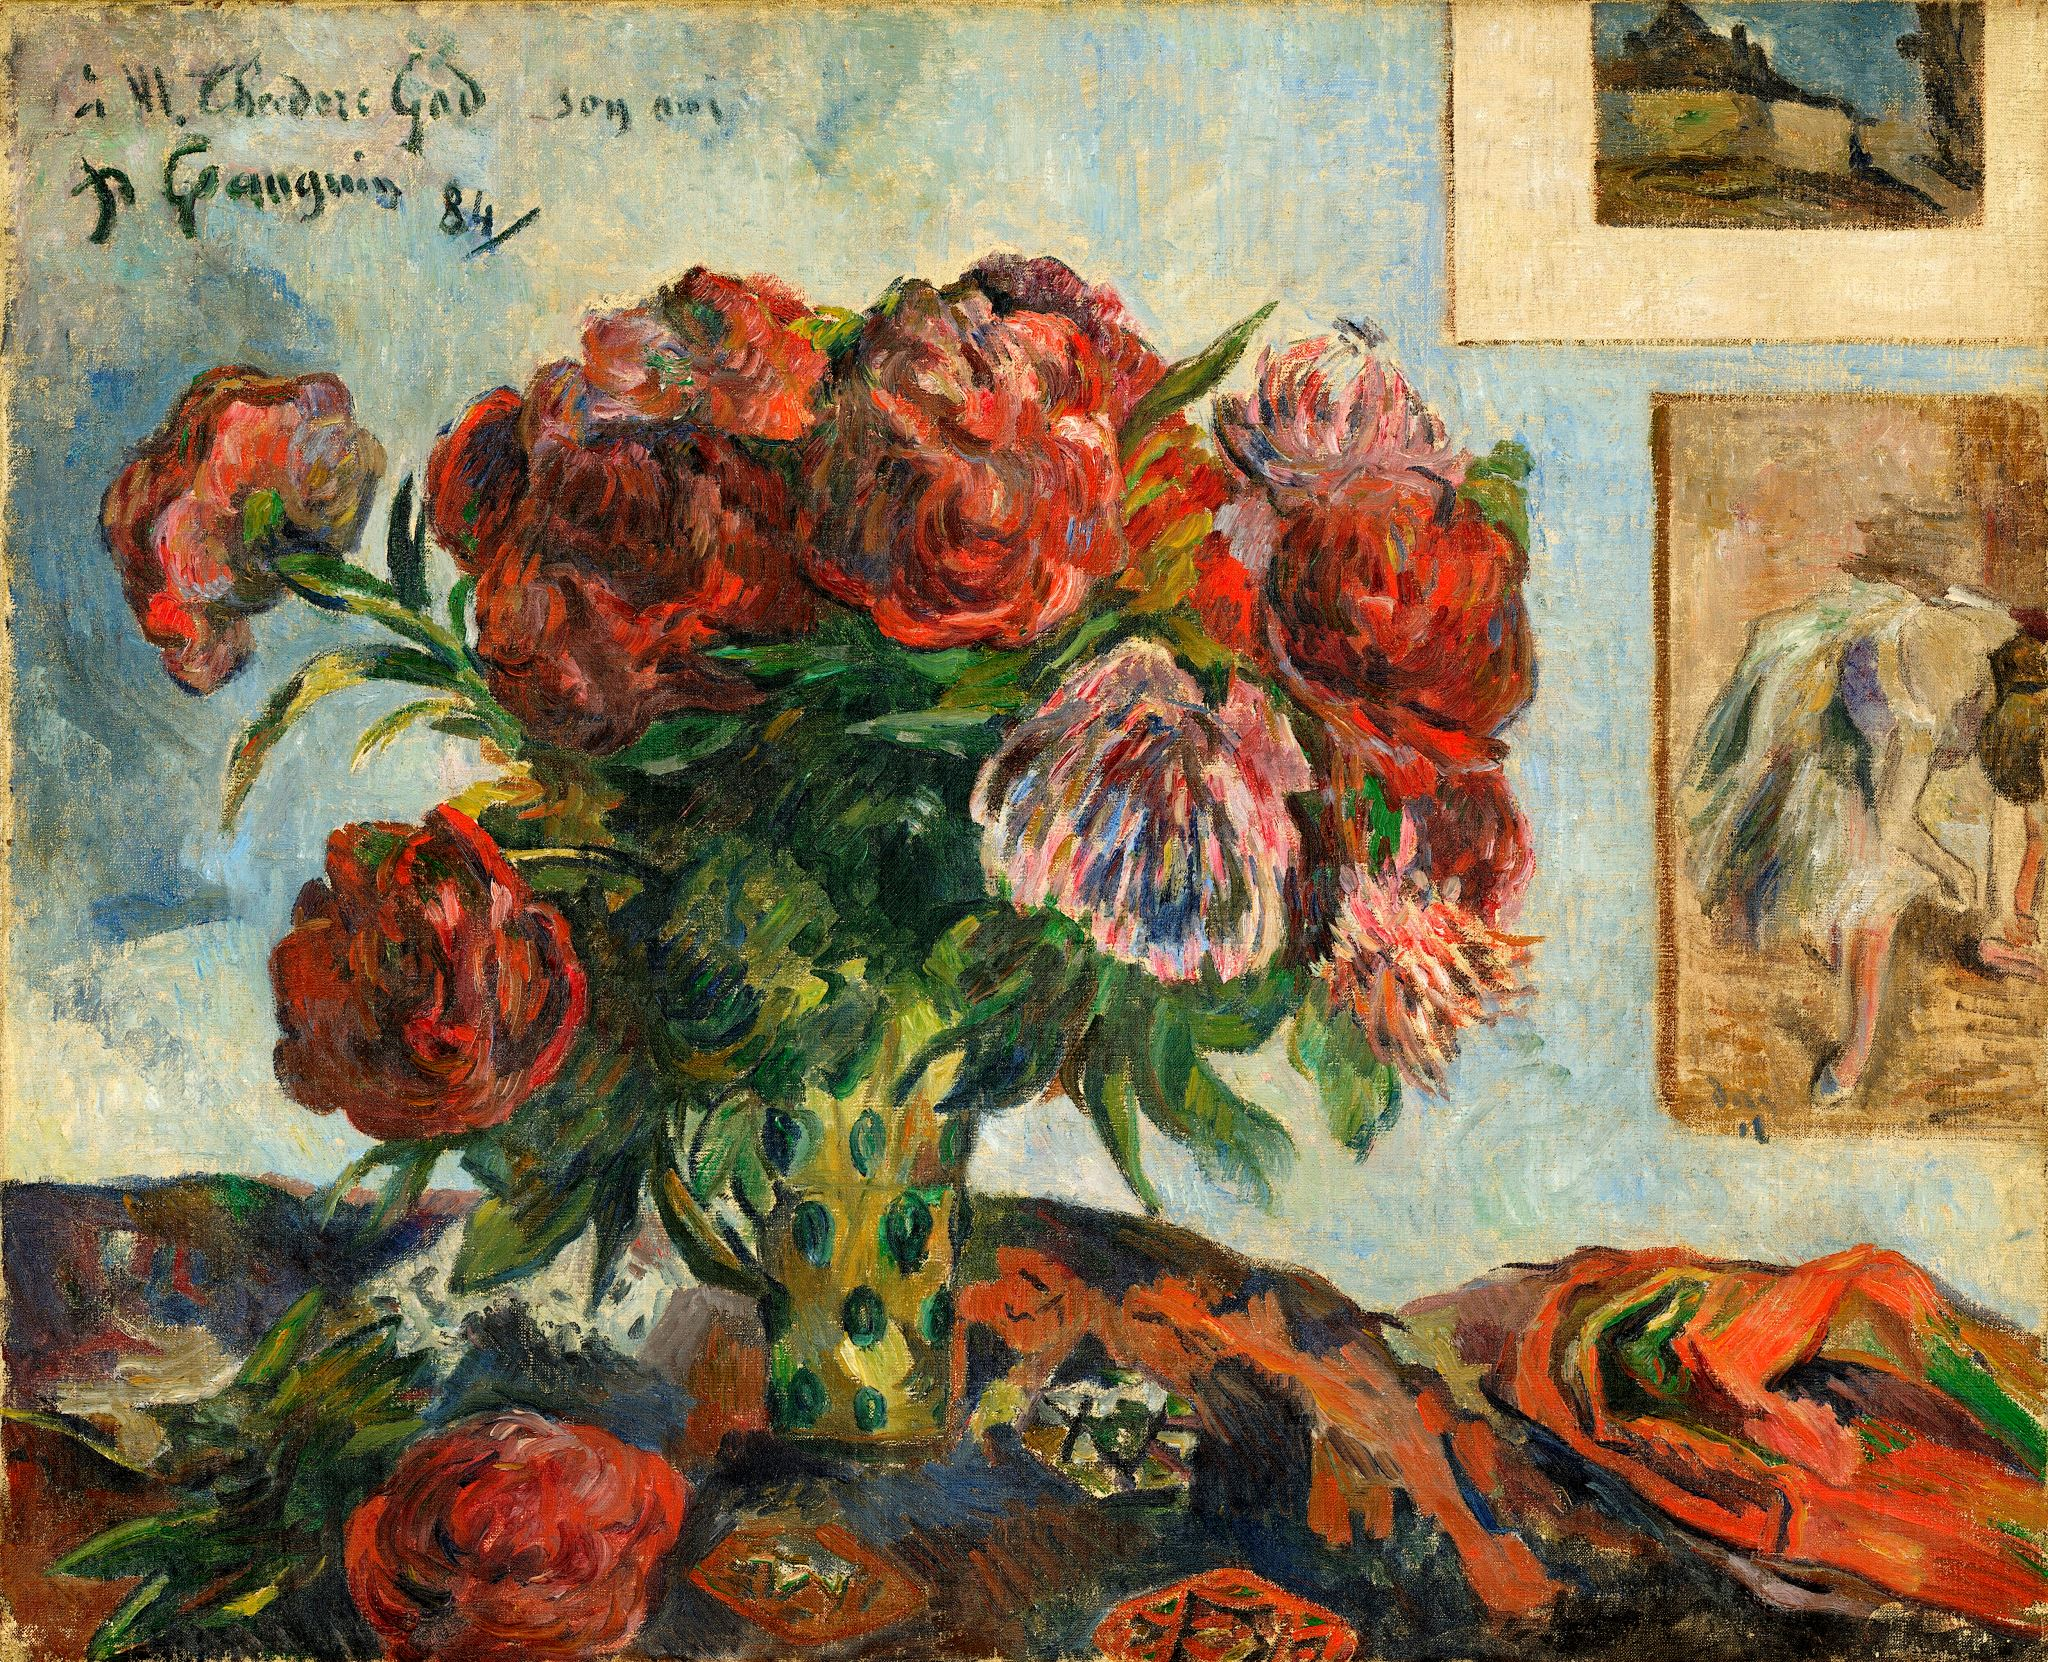 натюрморт цветы  < Ваза с пионами > :: Поль Гоген - Гоген Поль ( Paul Gauguin ) фото